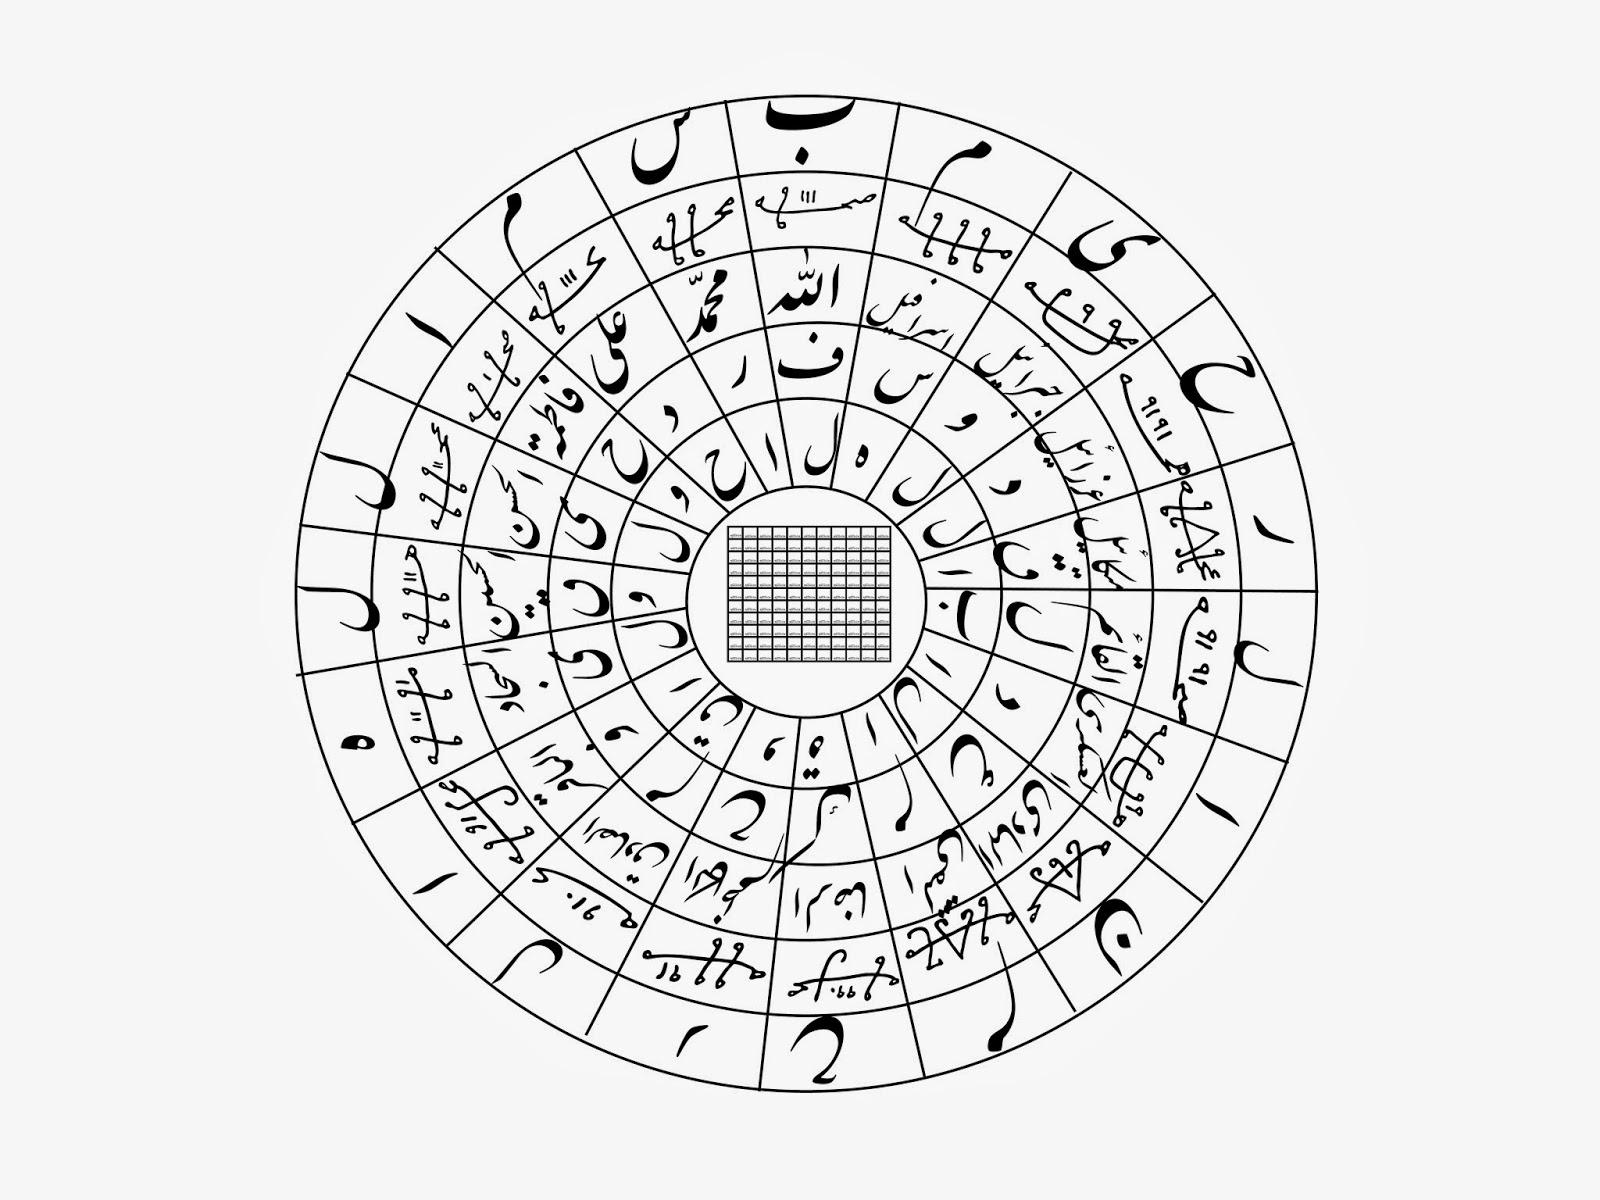 5x19 Circular Talisman (dā'ira)